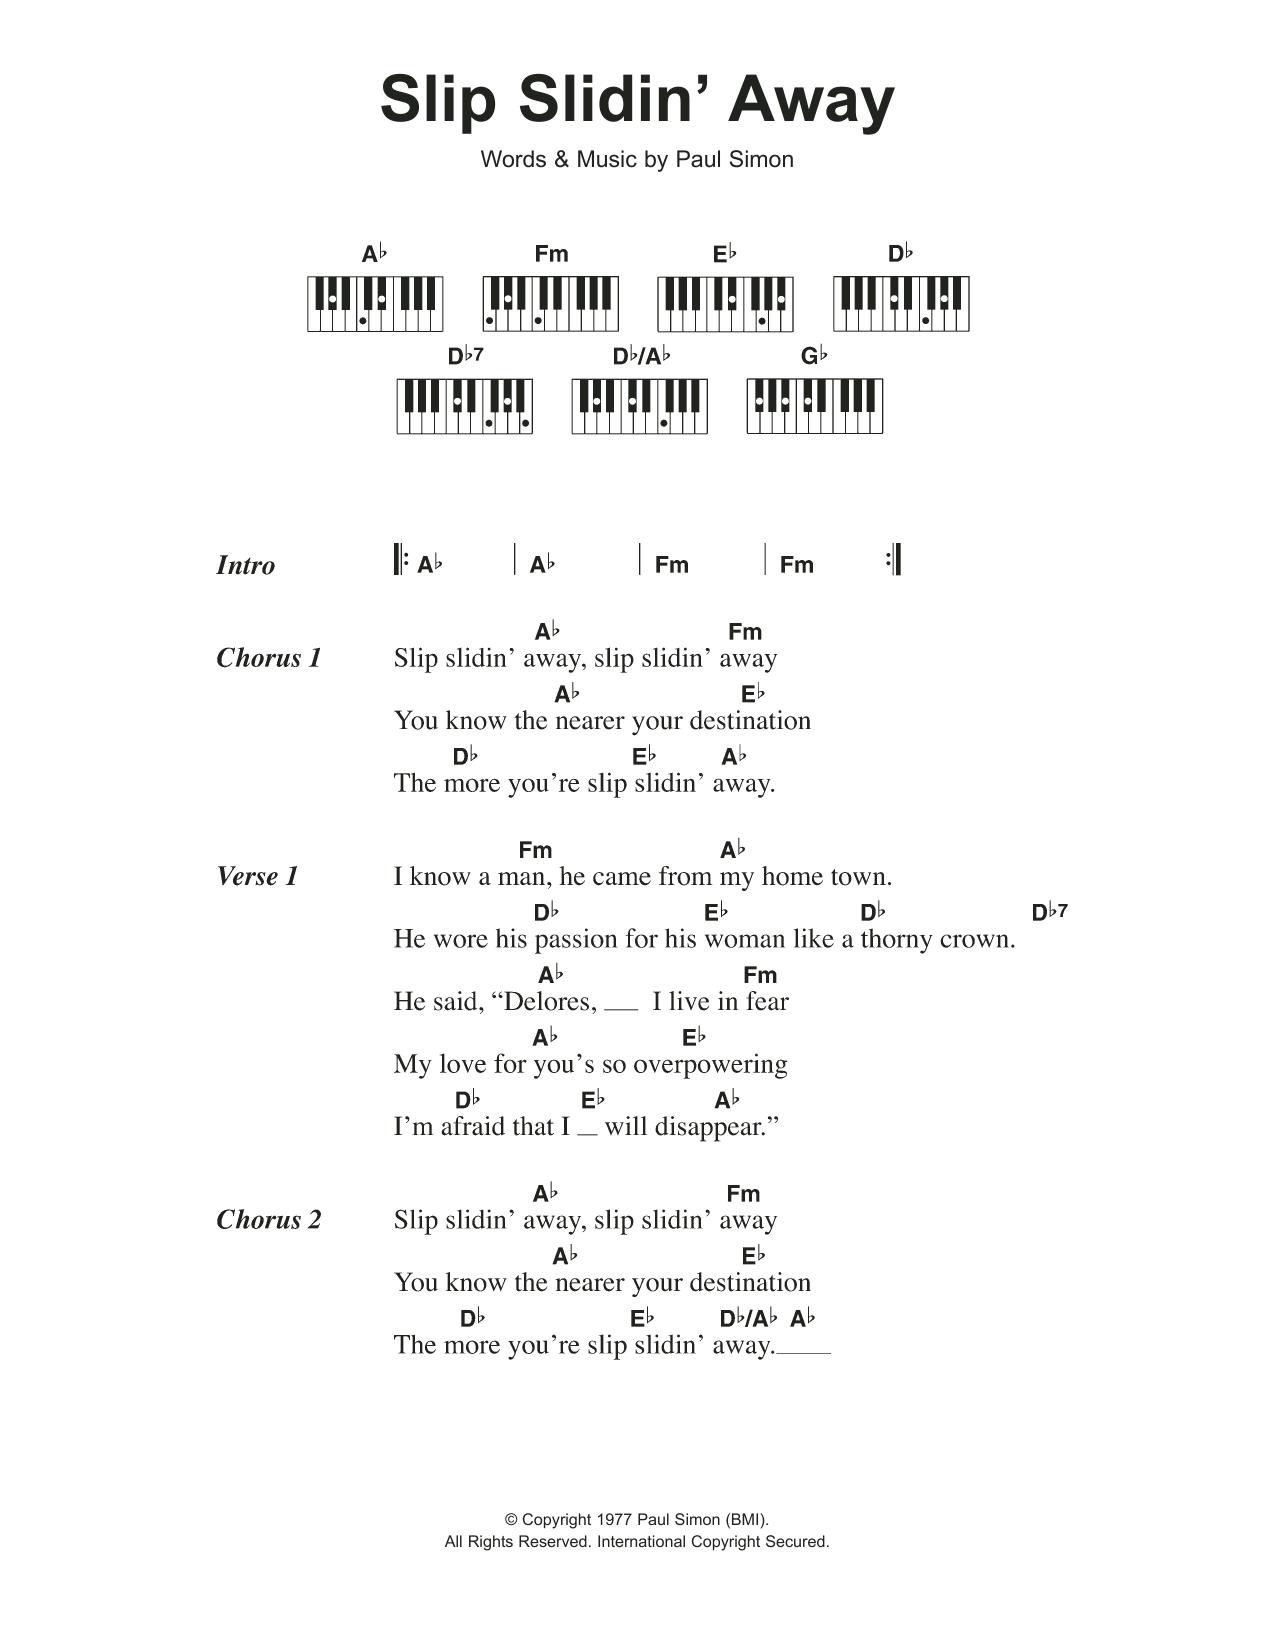 Slip Slidin Away Sheet Music Paul Simon Lyrics Piano Chords